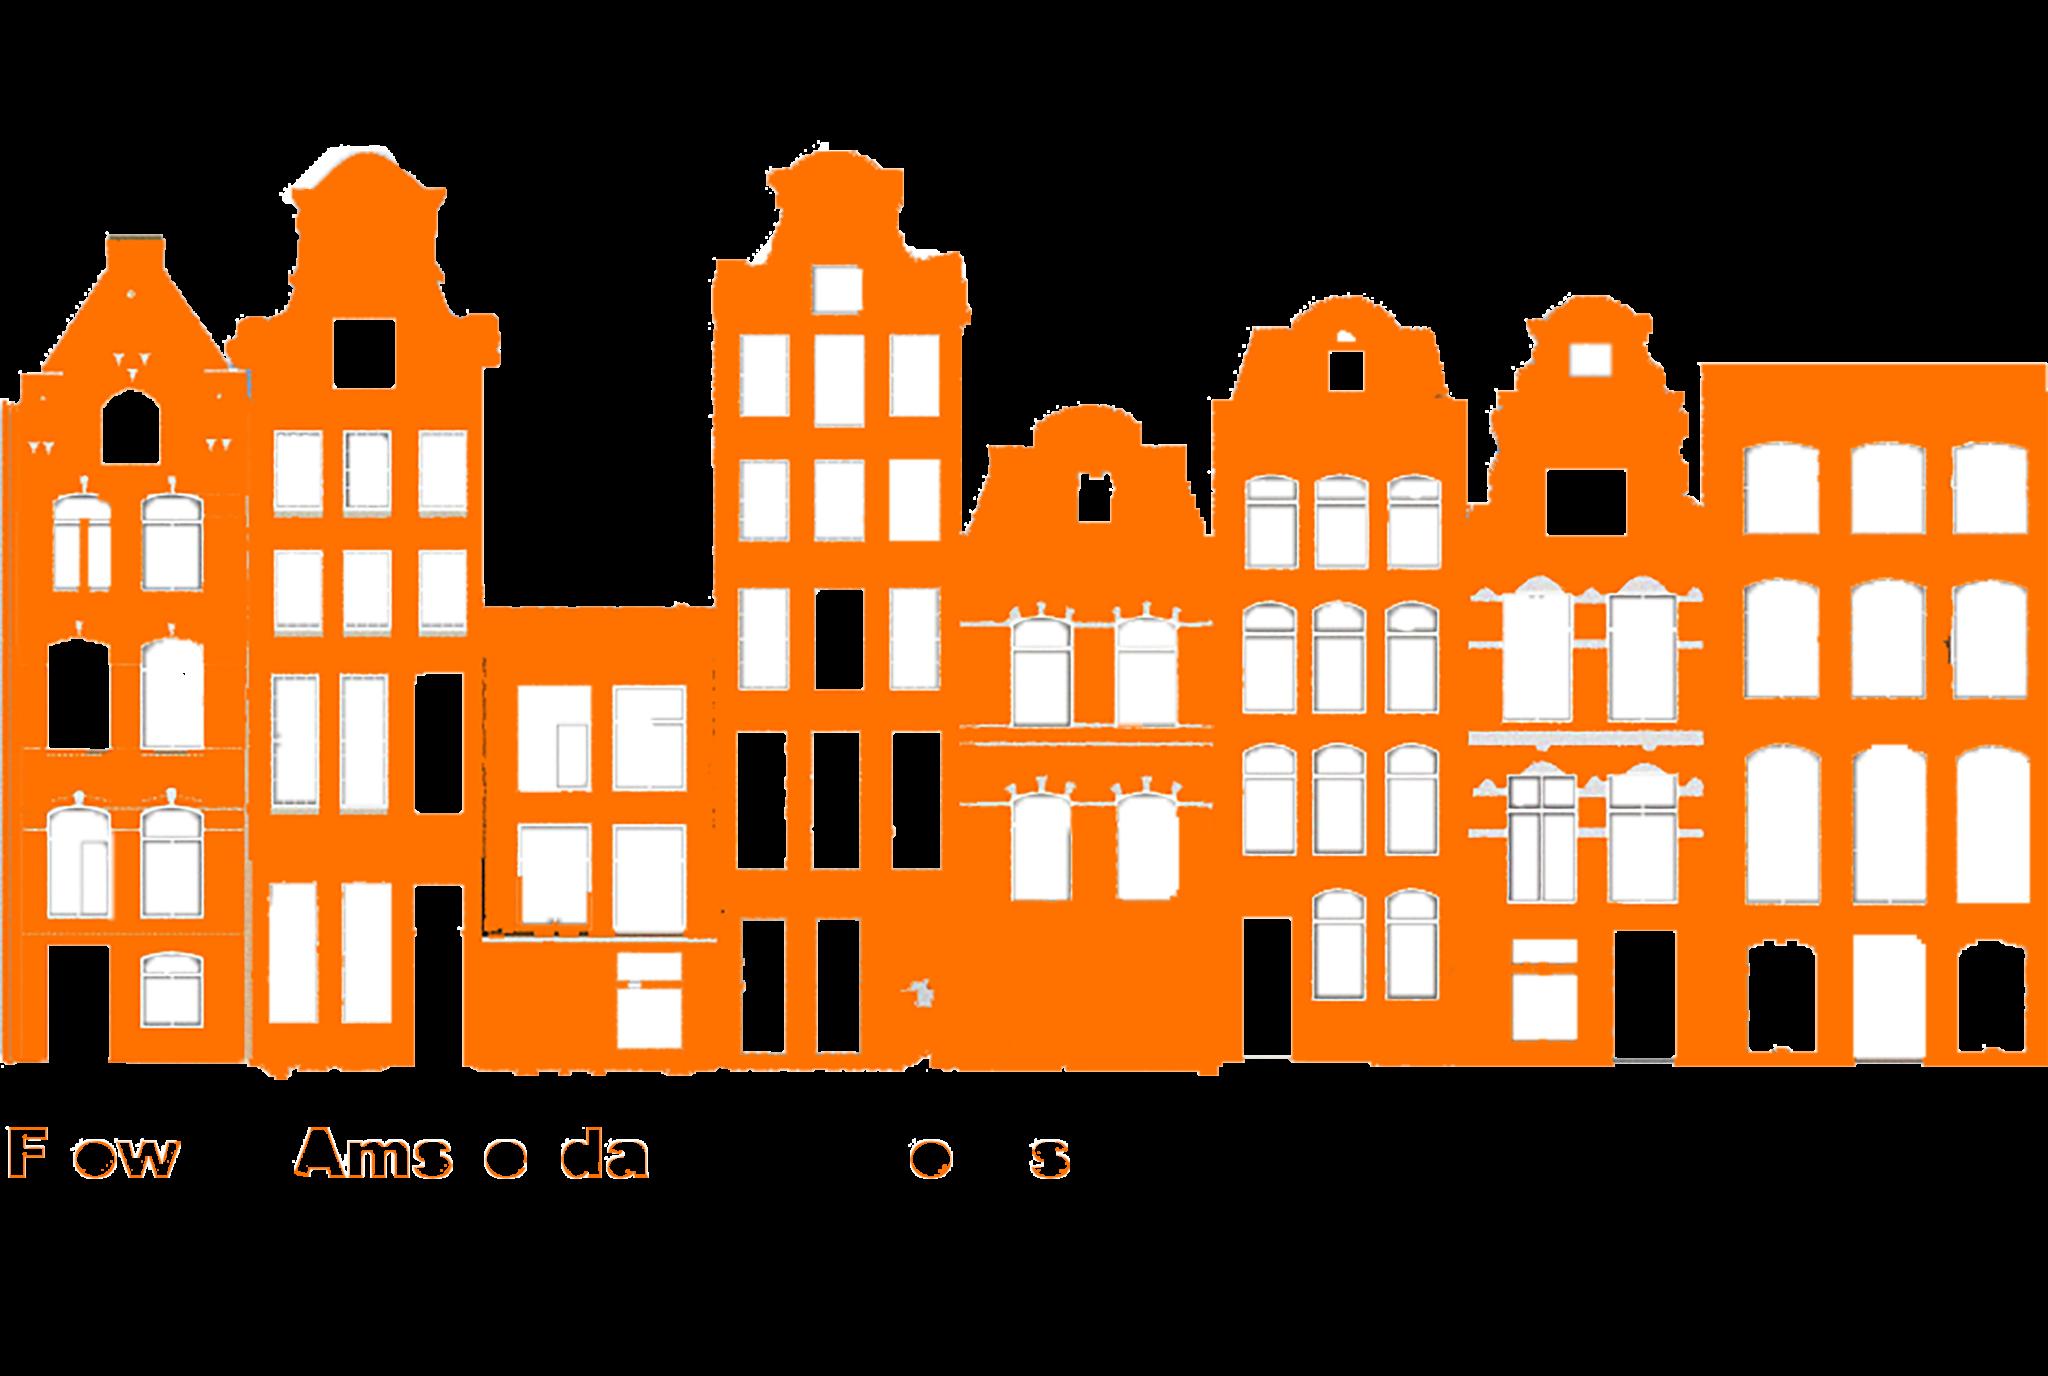 Flow in Amsterdam